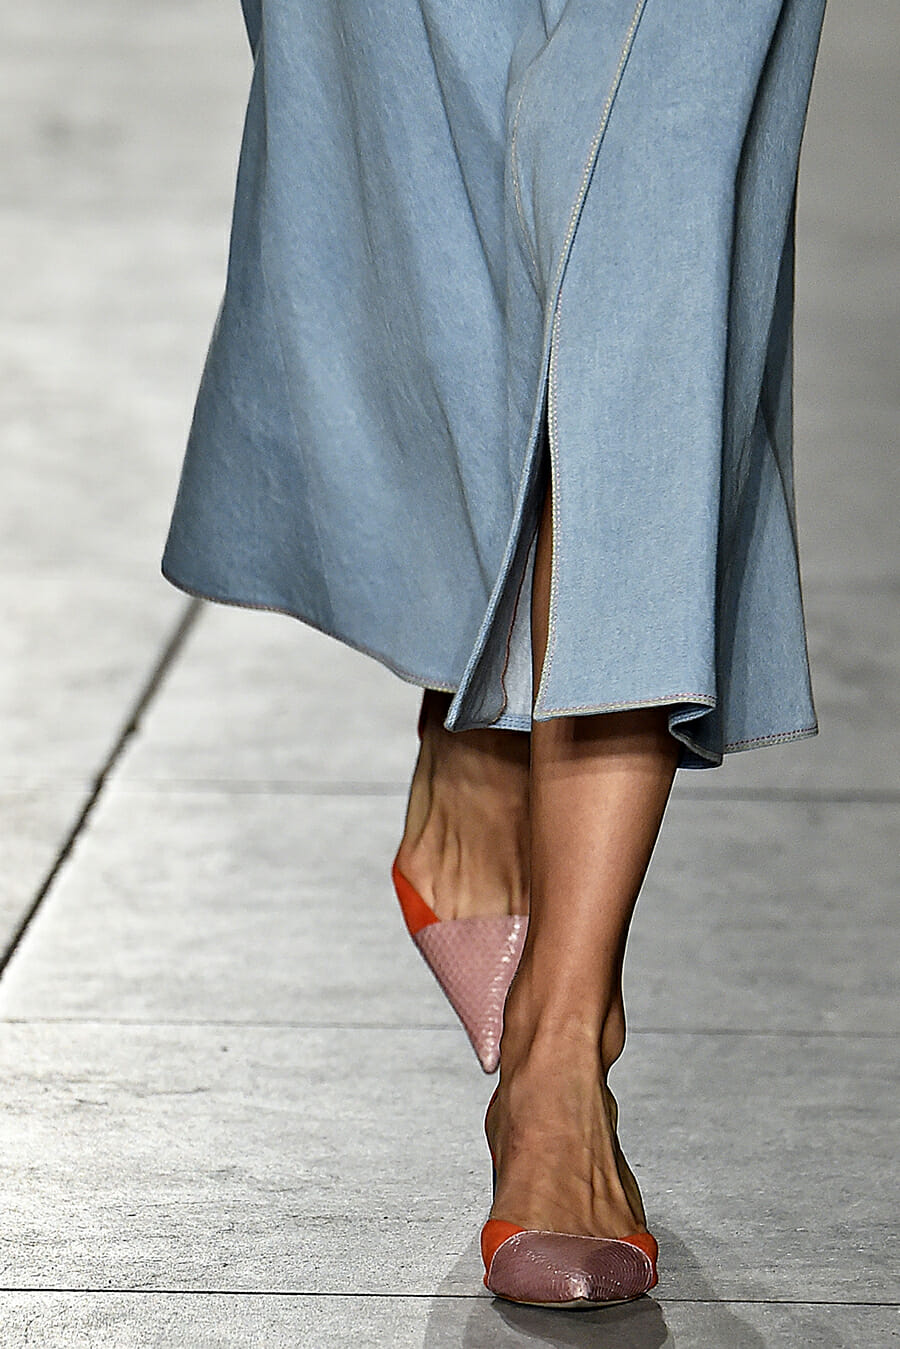 Carolina-Herrera-New-York-Fashion-Week-Spring-Summer-2018-NY-September-2017-look12-detail3